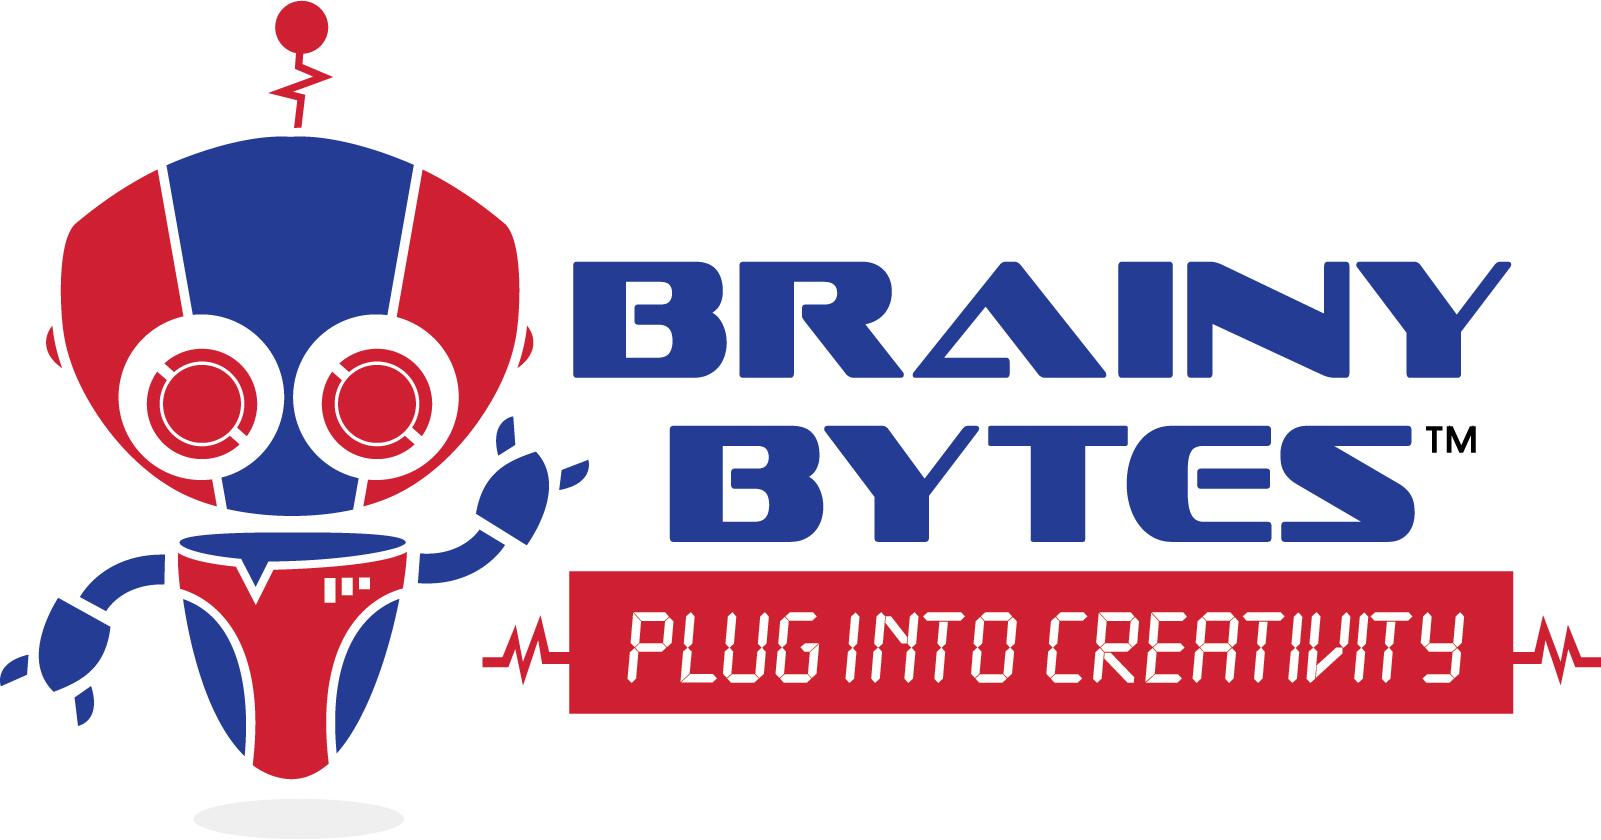 Brainy Bytes - Plug Into Creativity